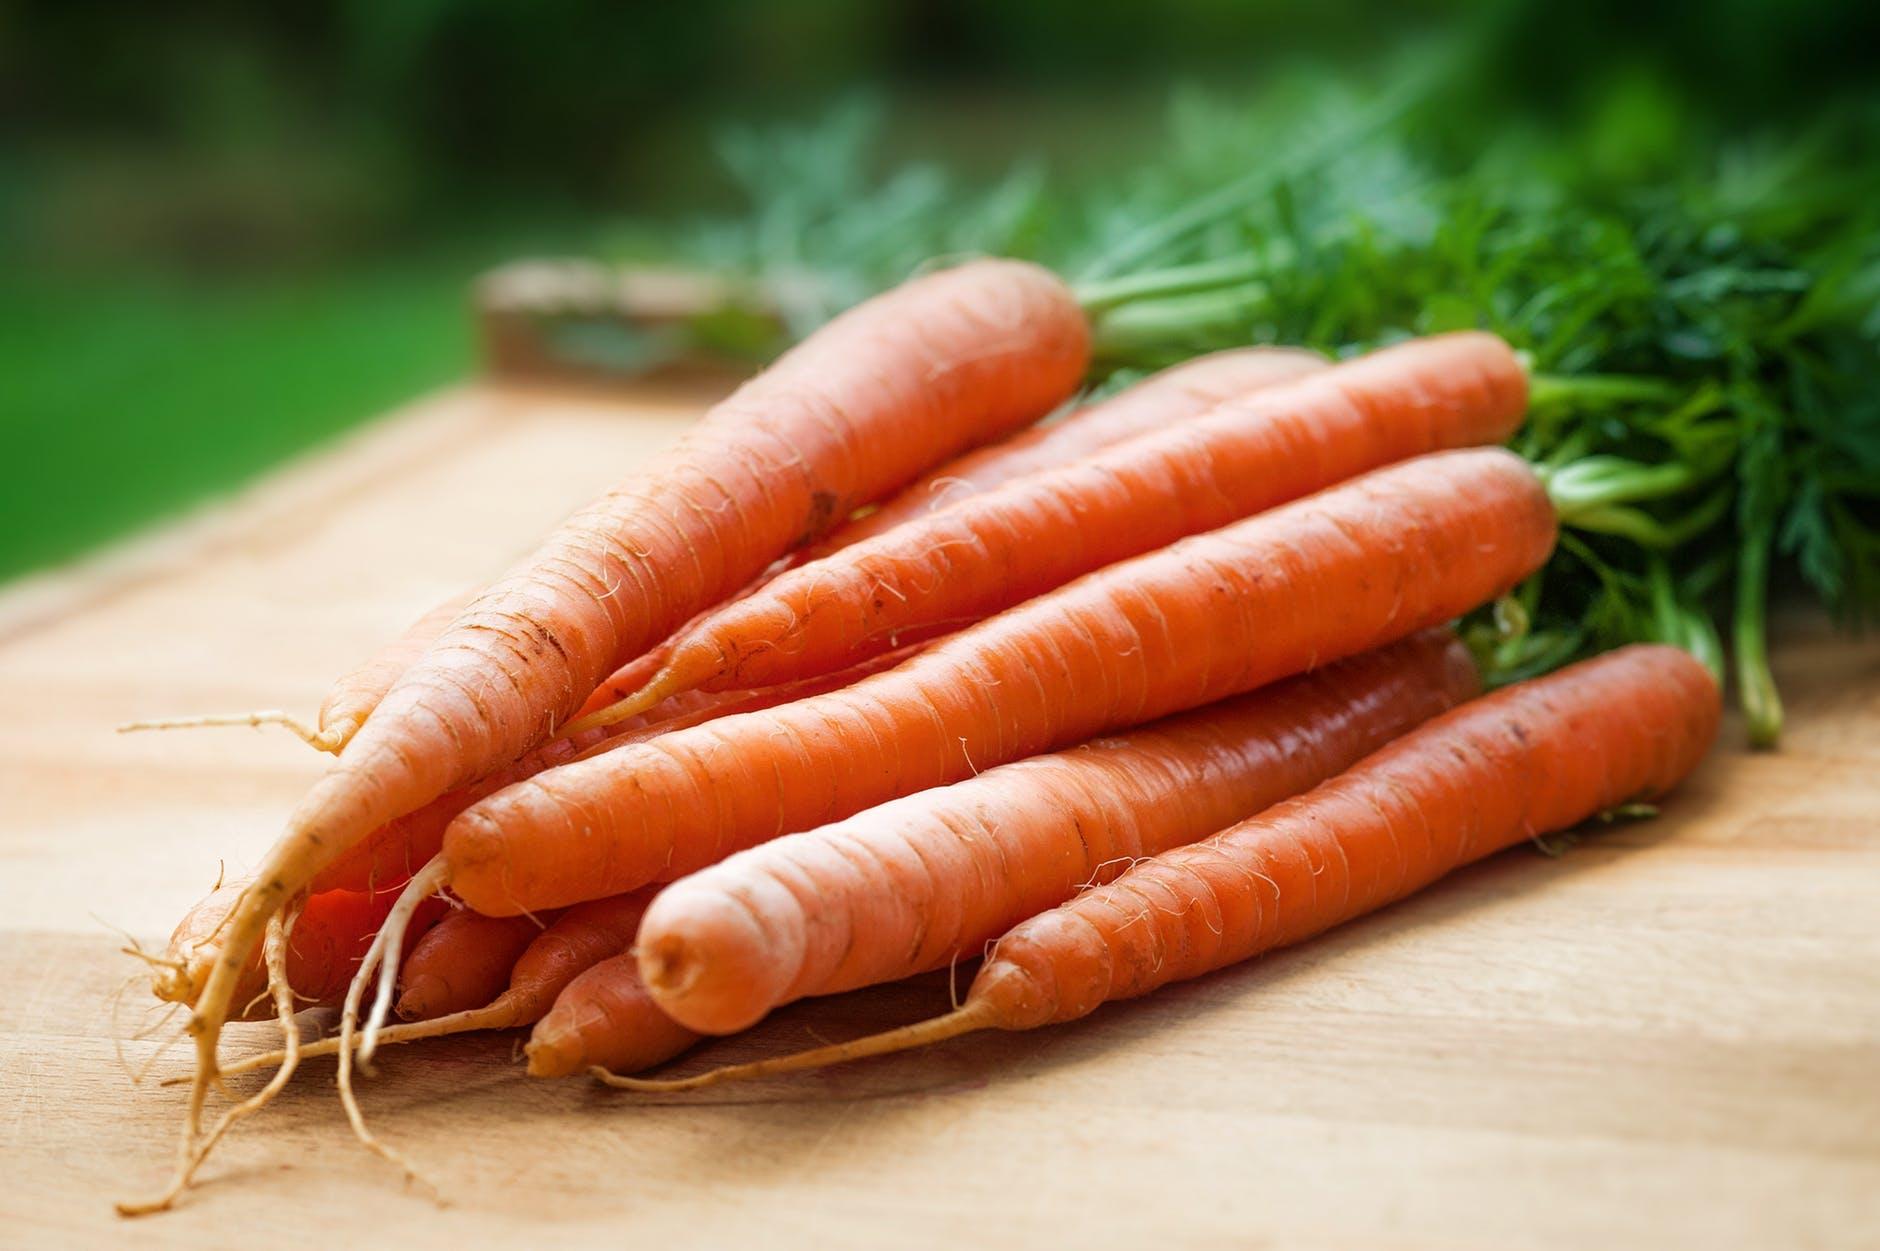 Carrot = แครอท